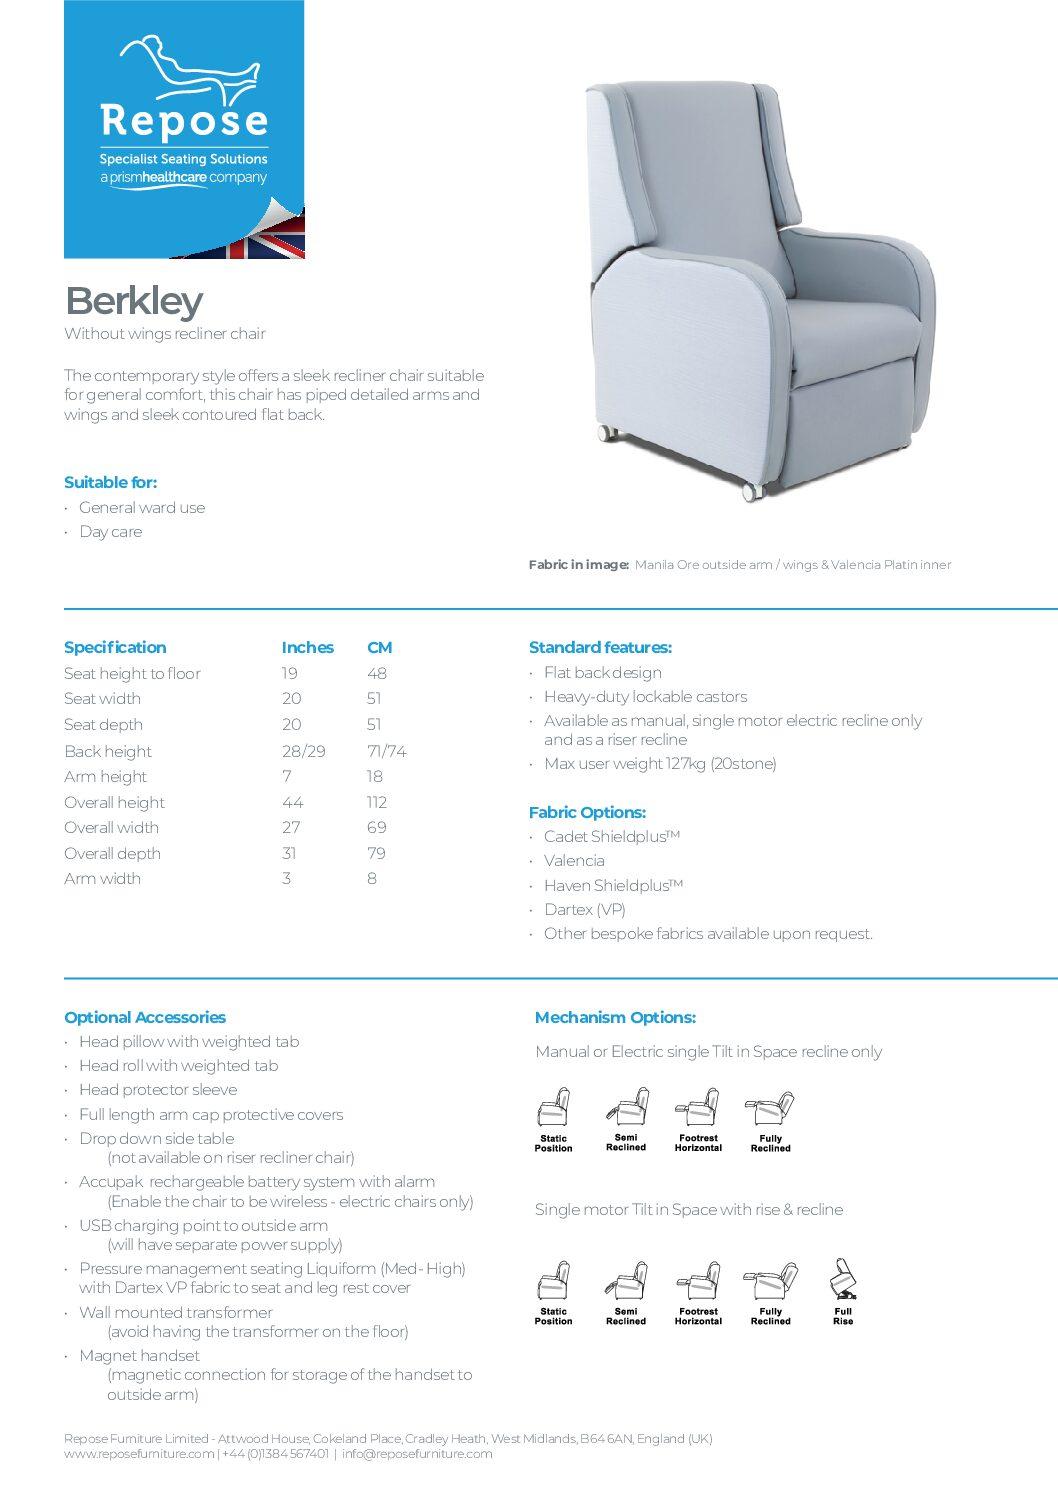 PDF specification Berkley v6 1 pdf Repose Furniture Downloads and Brochure Request